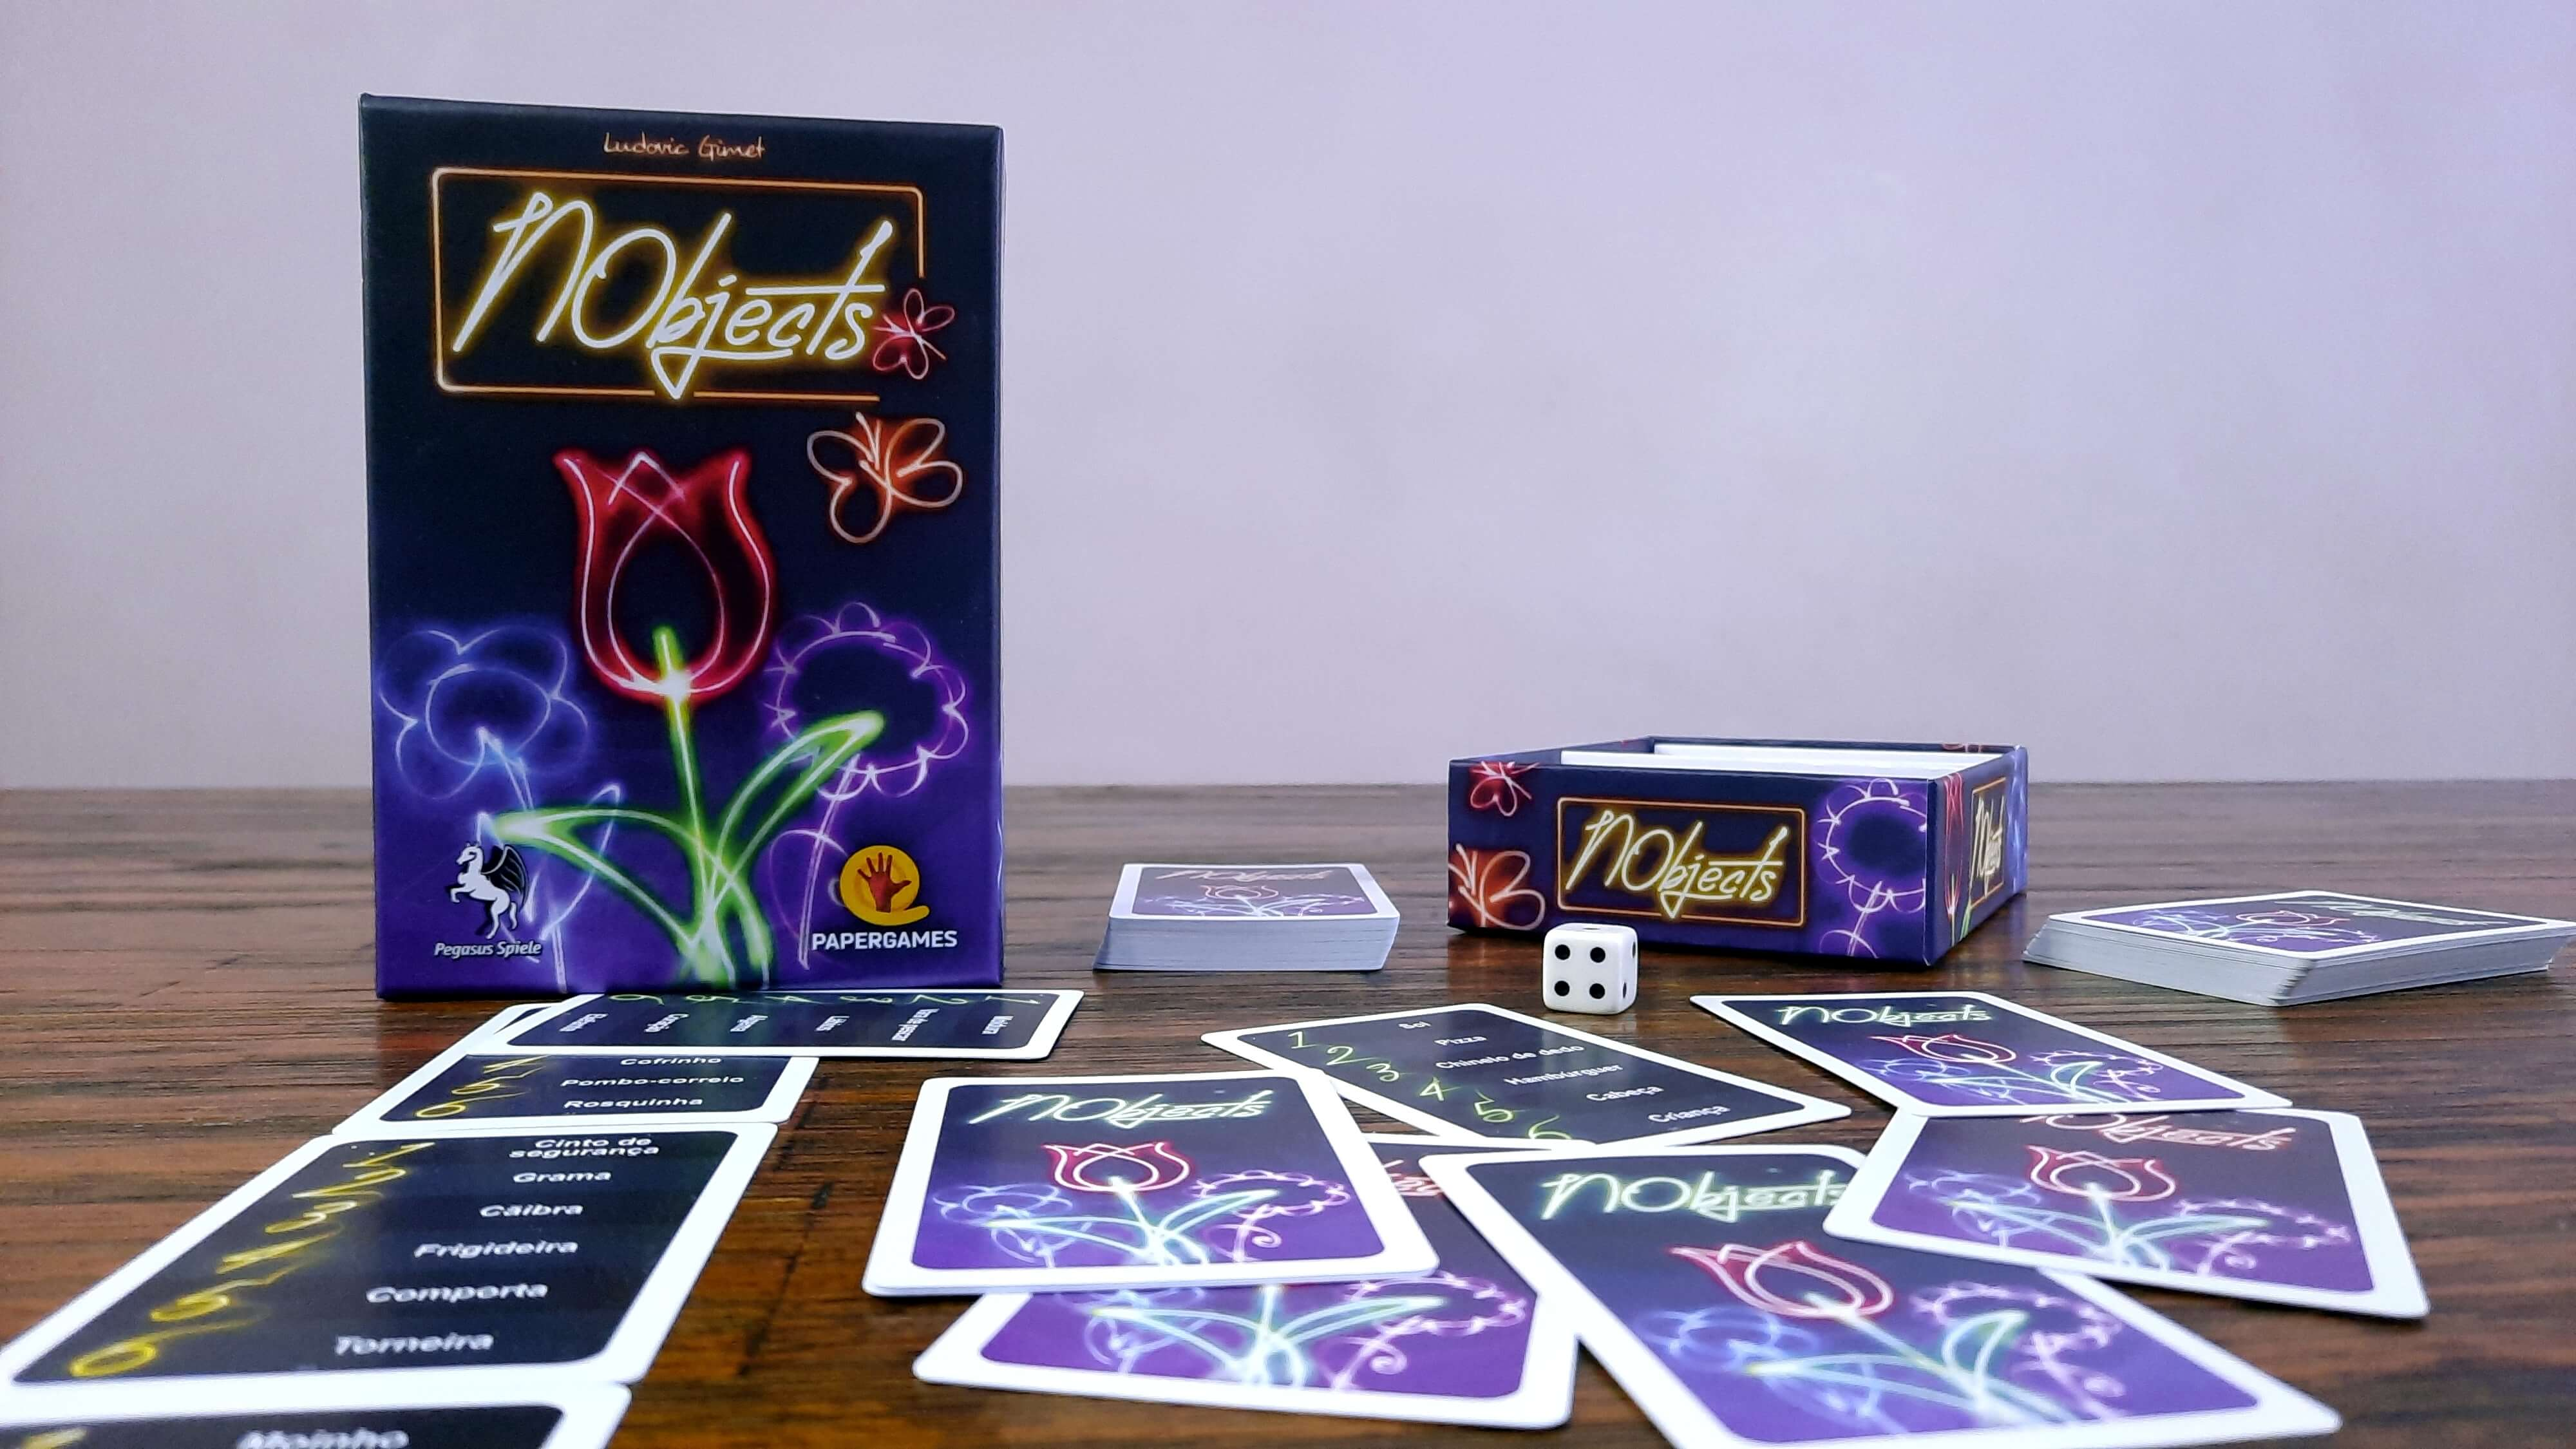 Jogo de cartas NObjects